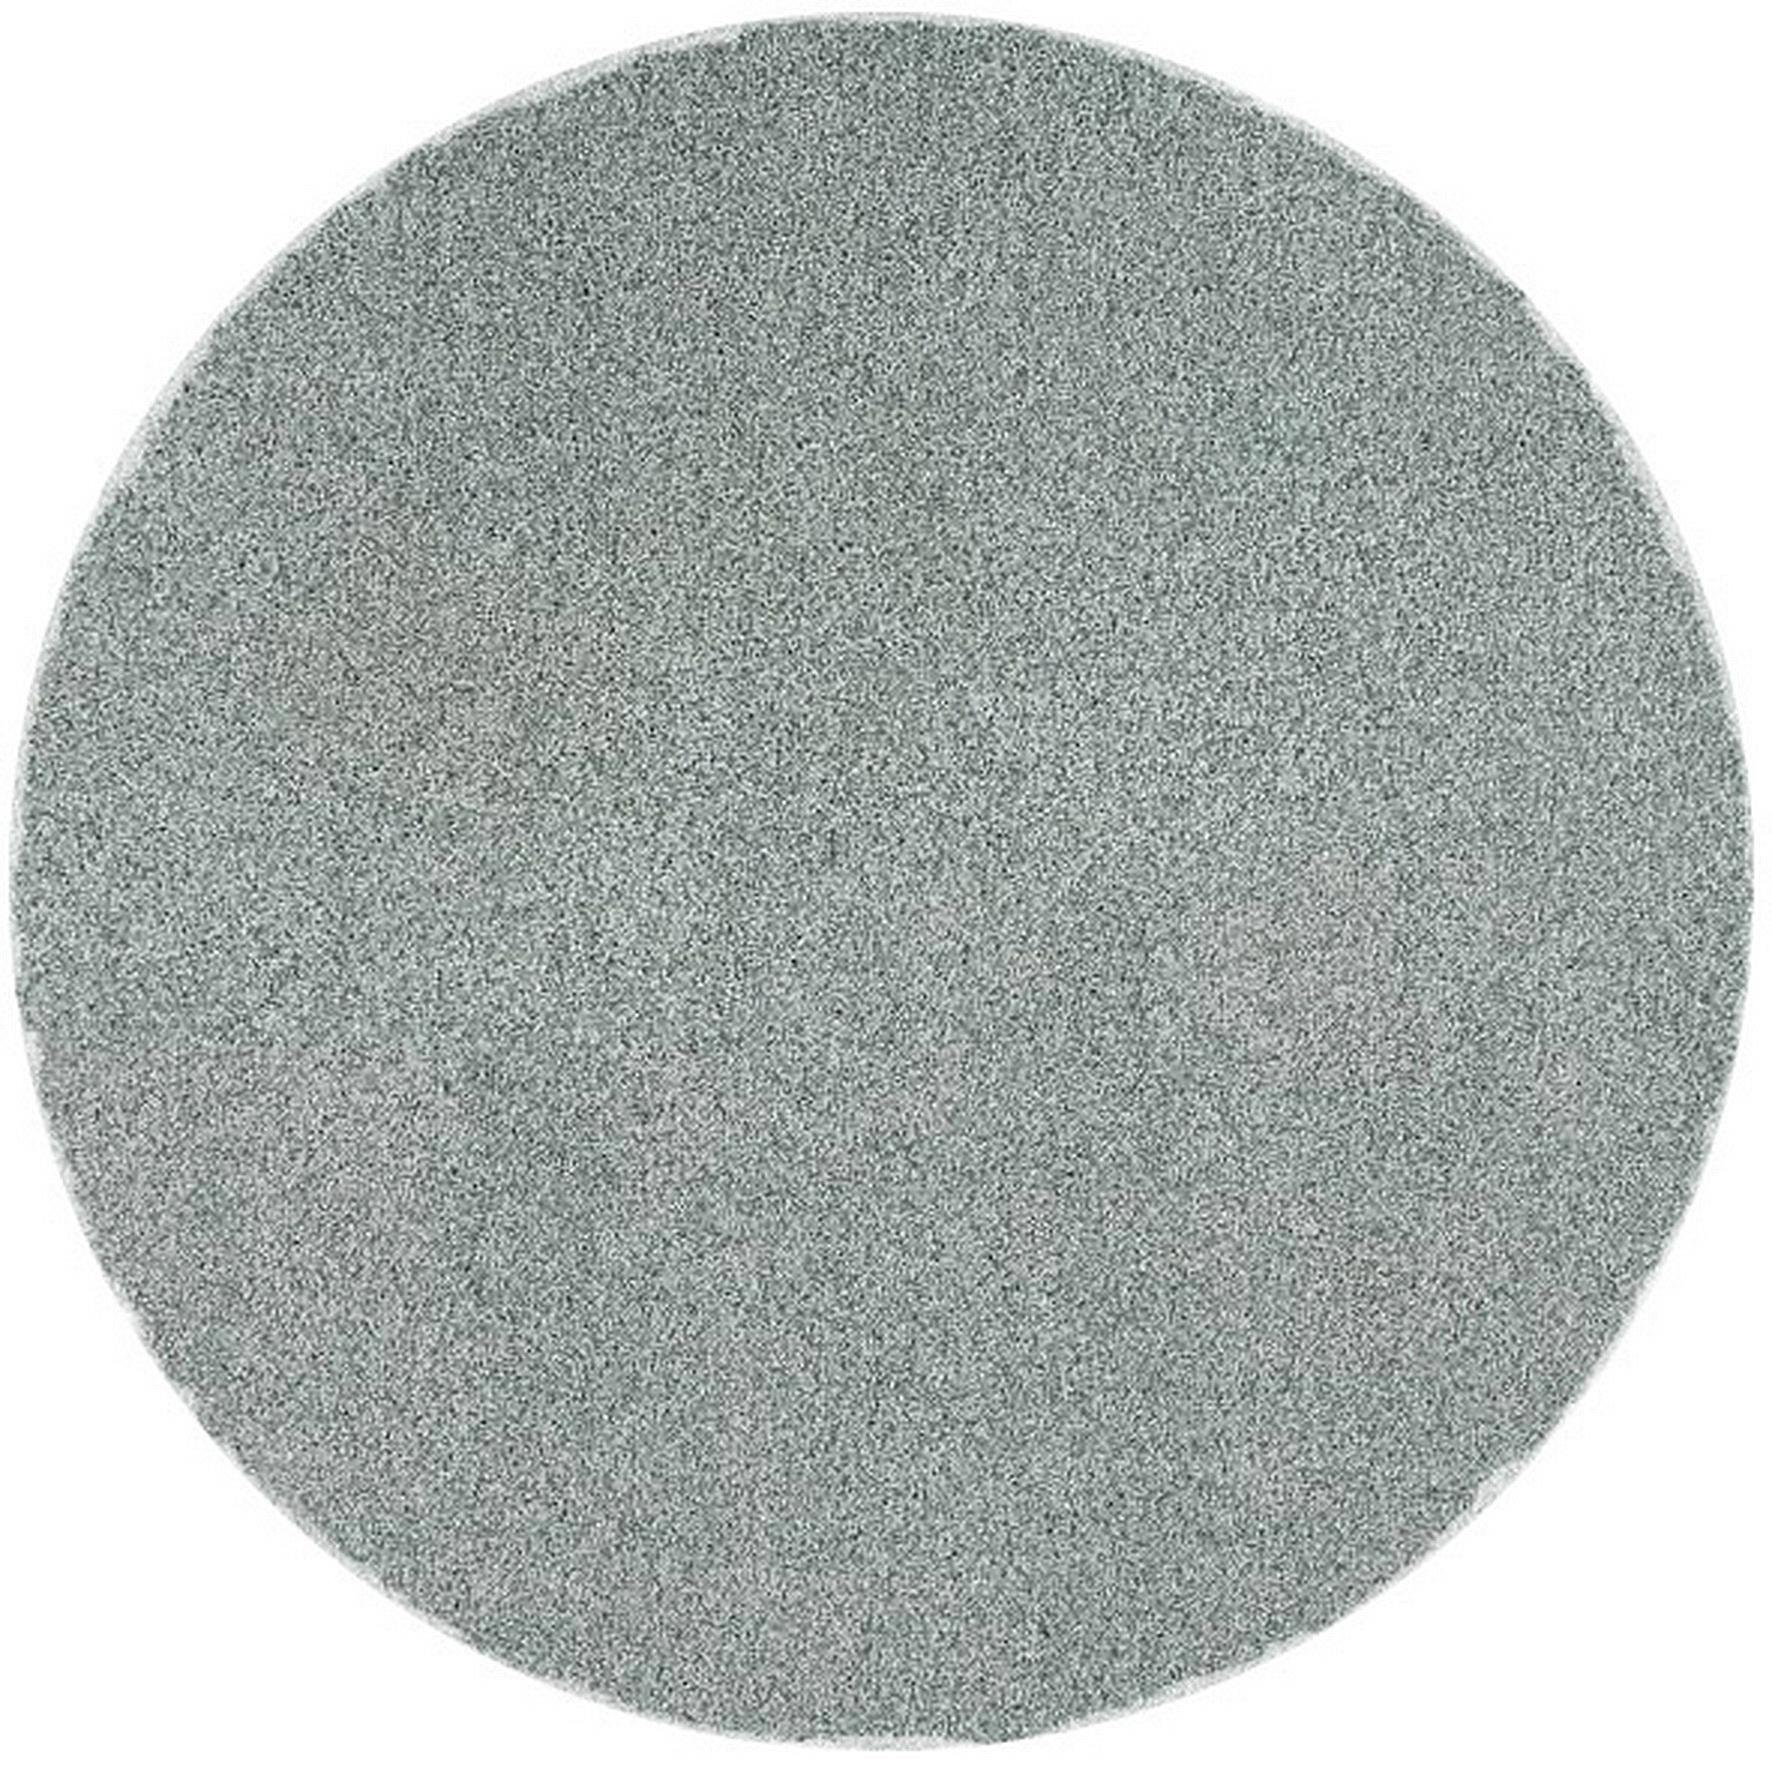 Webteppich Rubin In Iceblau, Ø ca. 200cm - Hellblau, ROMANTIK / LANDHAUS, Kunststoff (200cm) - MÖMAX modern living